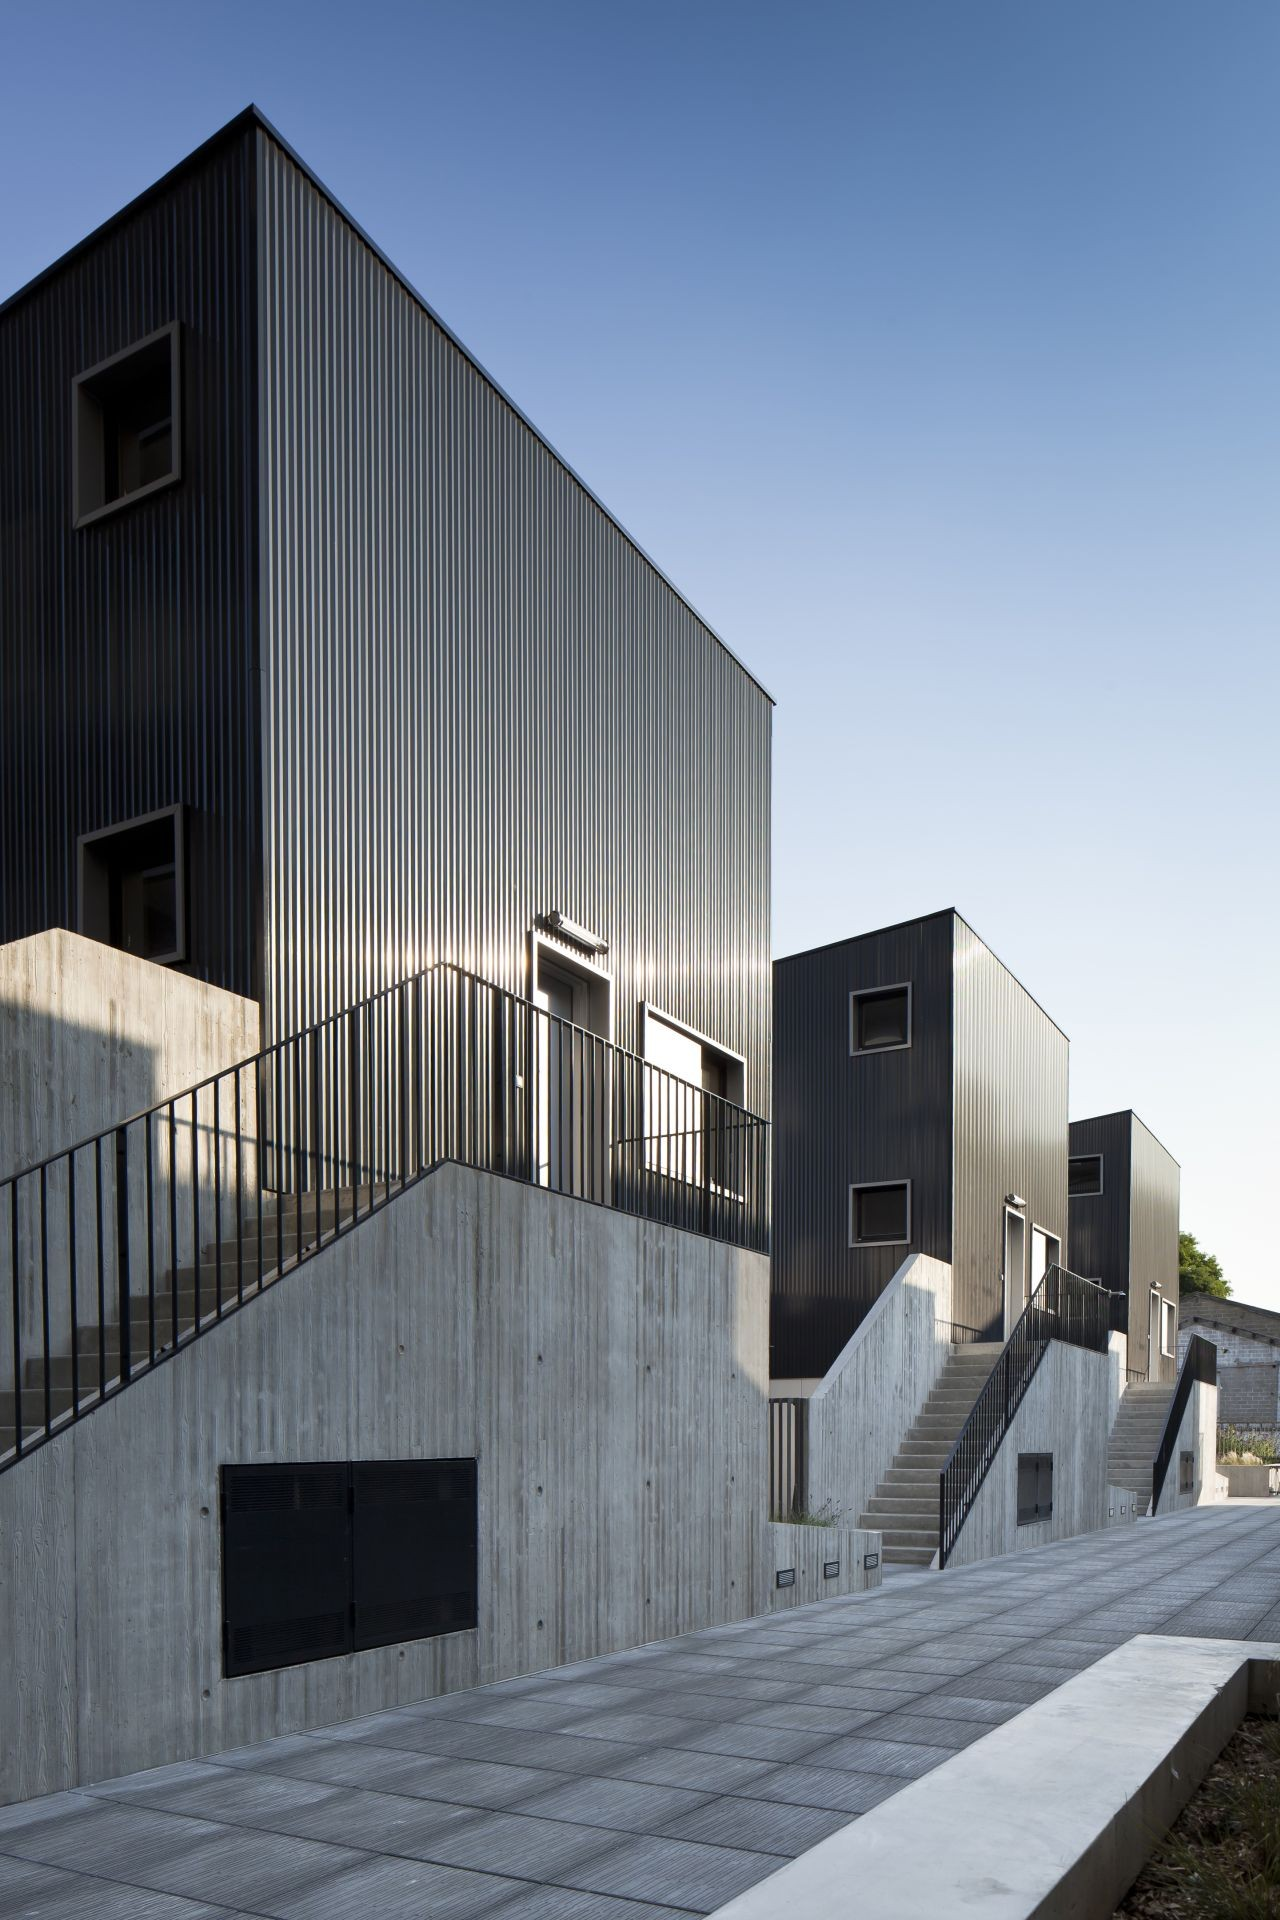 gallery of 48 logements vitry sur seine ga tan le penhuel architecture 11. Black Bedroom Furniture Sets. Home Design Ideas